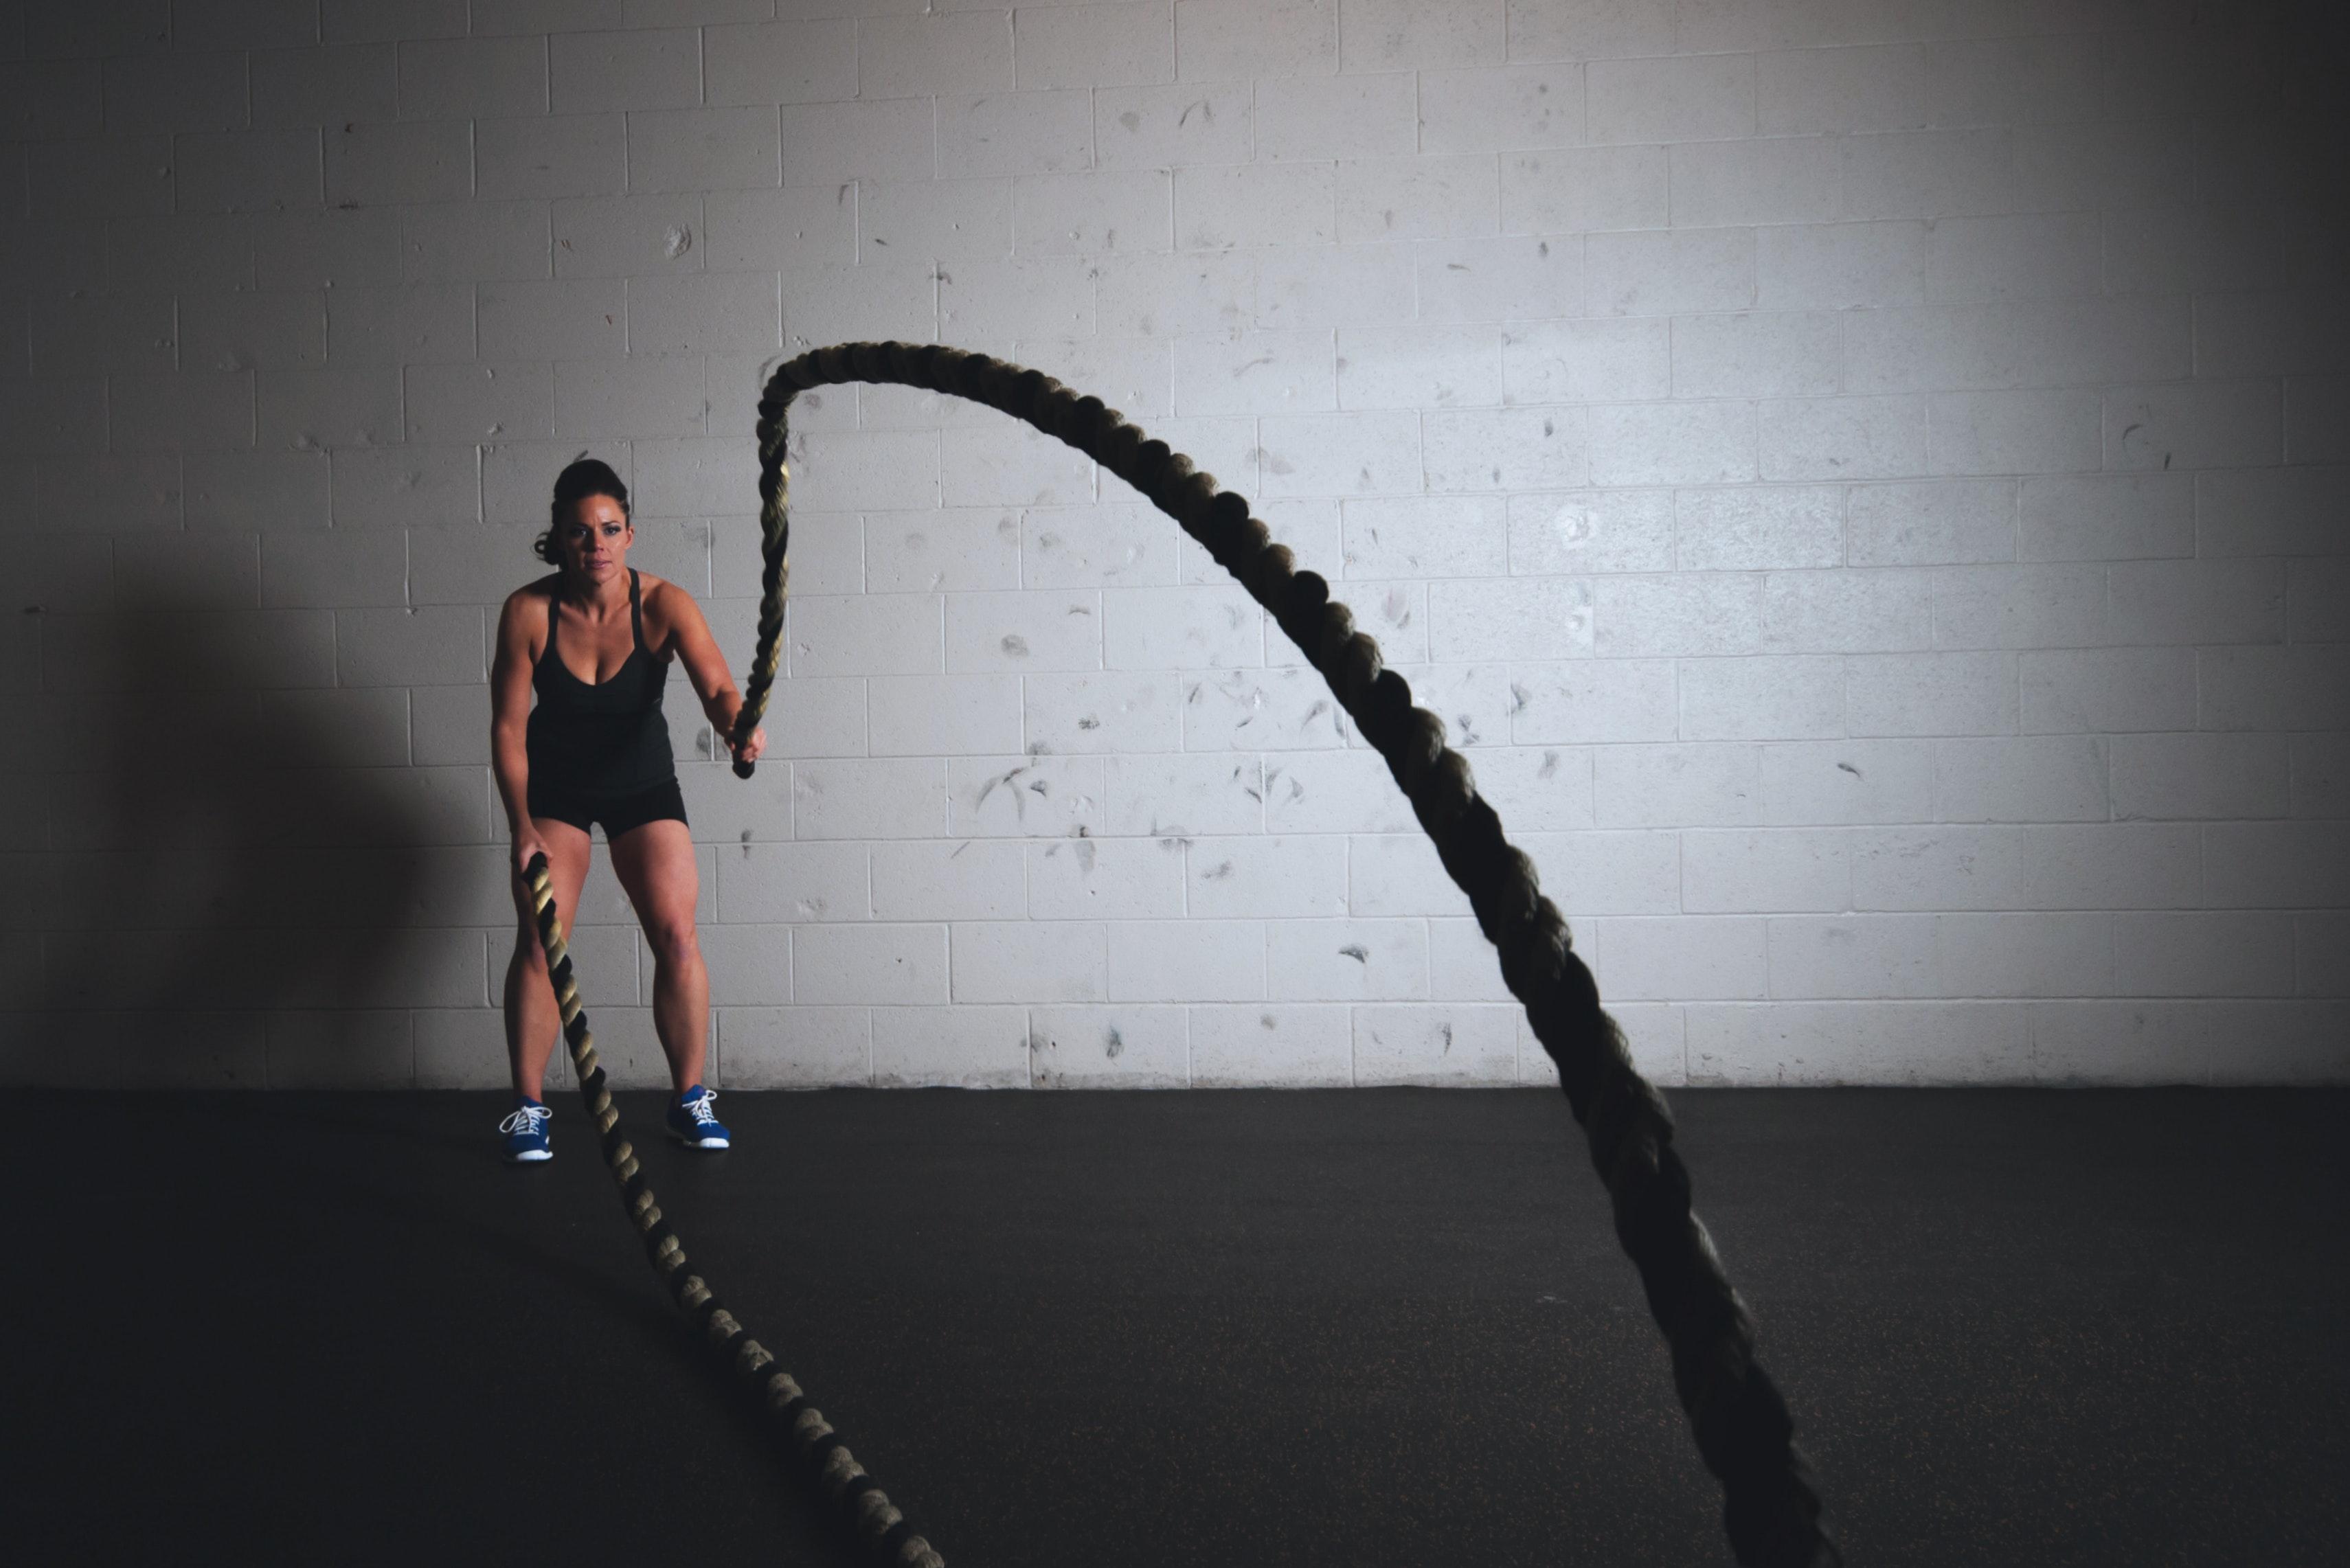 crossfit-fitness-gym-28080